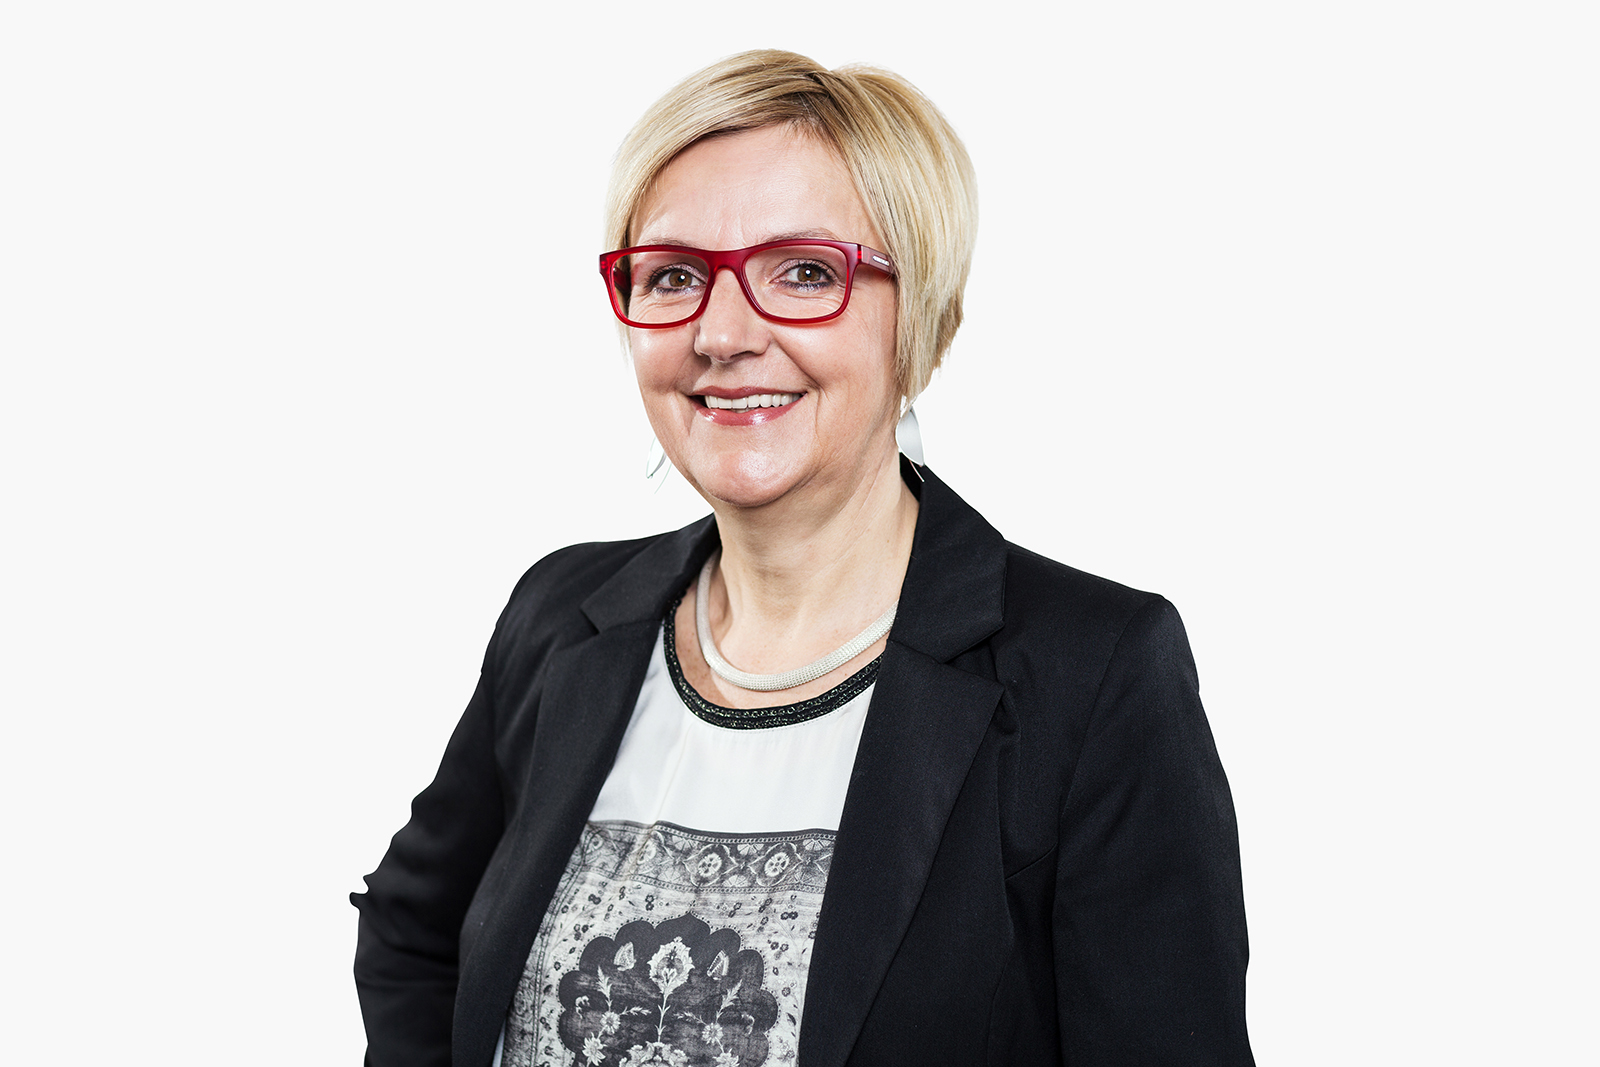 Maria Heber